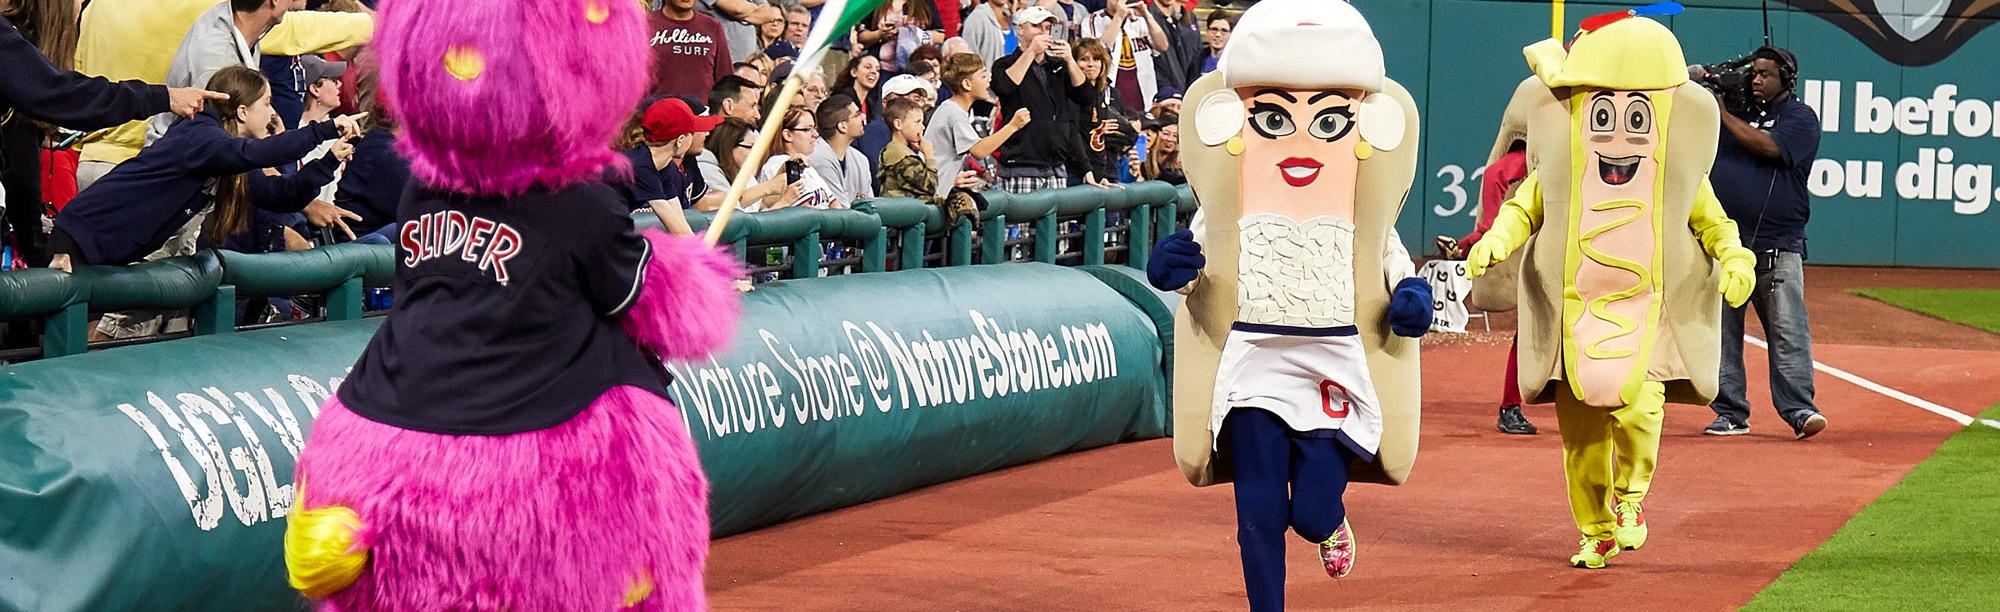 Cleveland Indian's hot dog mascots run race